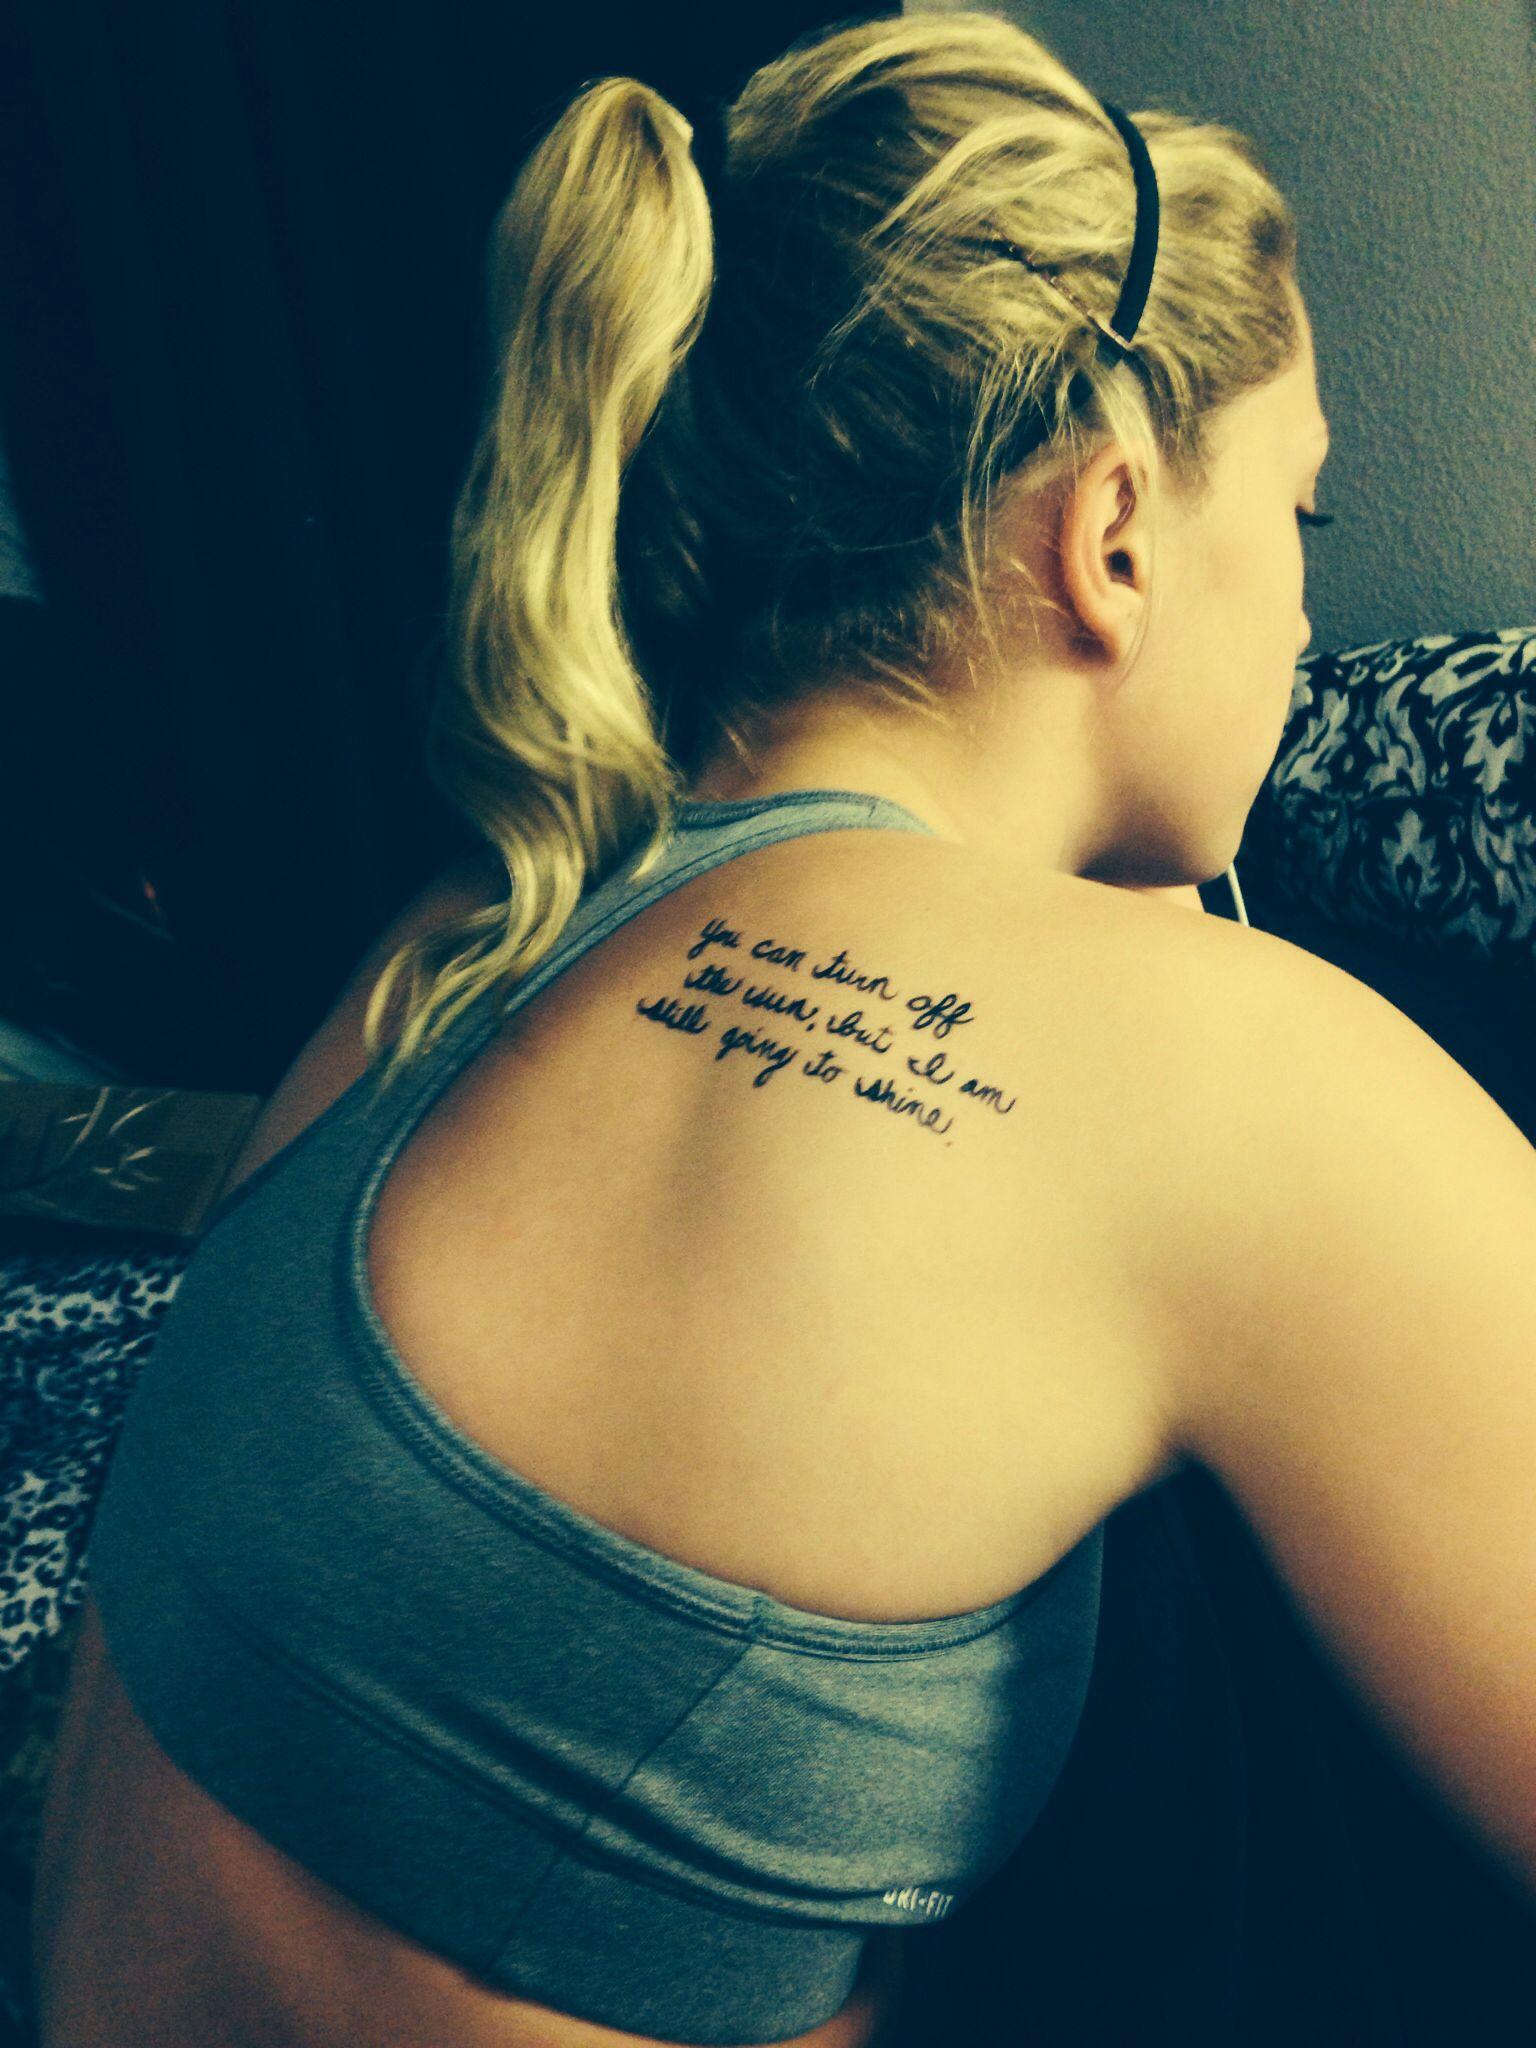 Back tattoo quote tattoo | Tattoo quotes, Back tattoo quotes ...